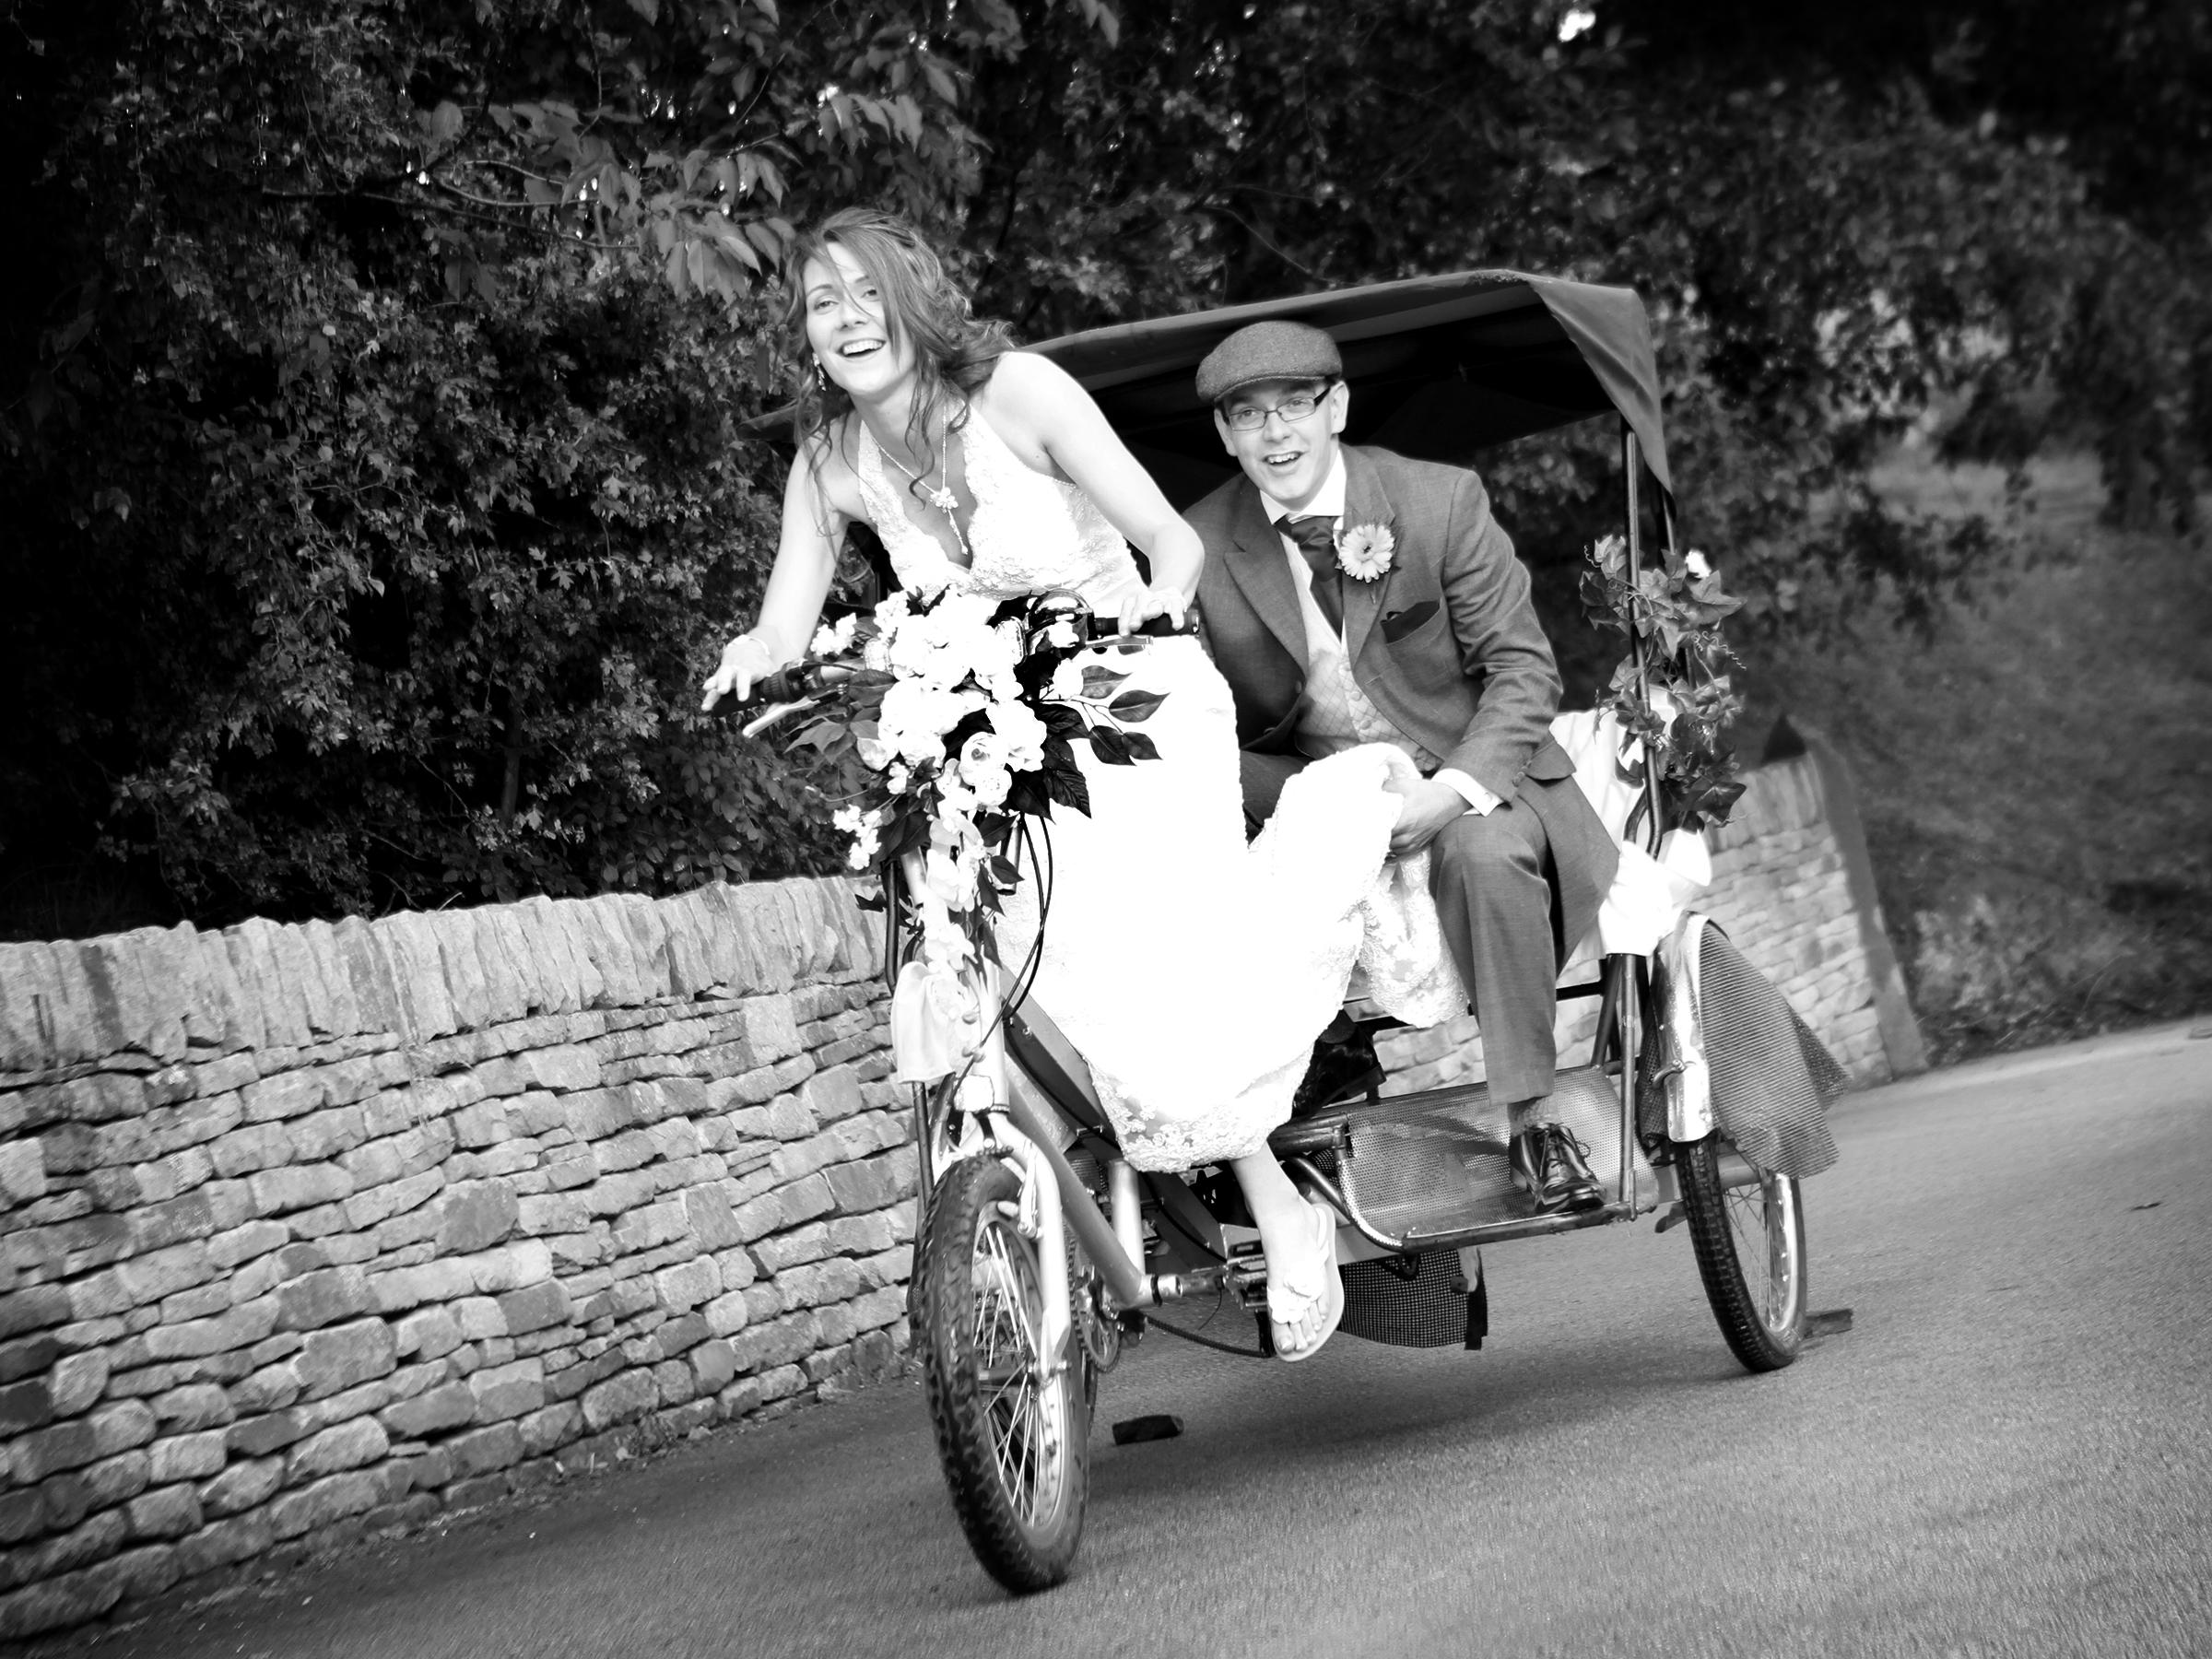 alan-vicky-bell-wedding-2.jpg